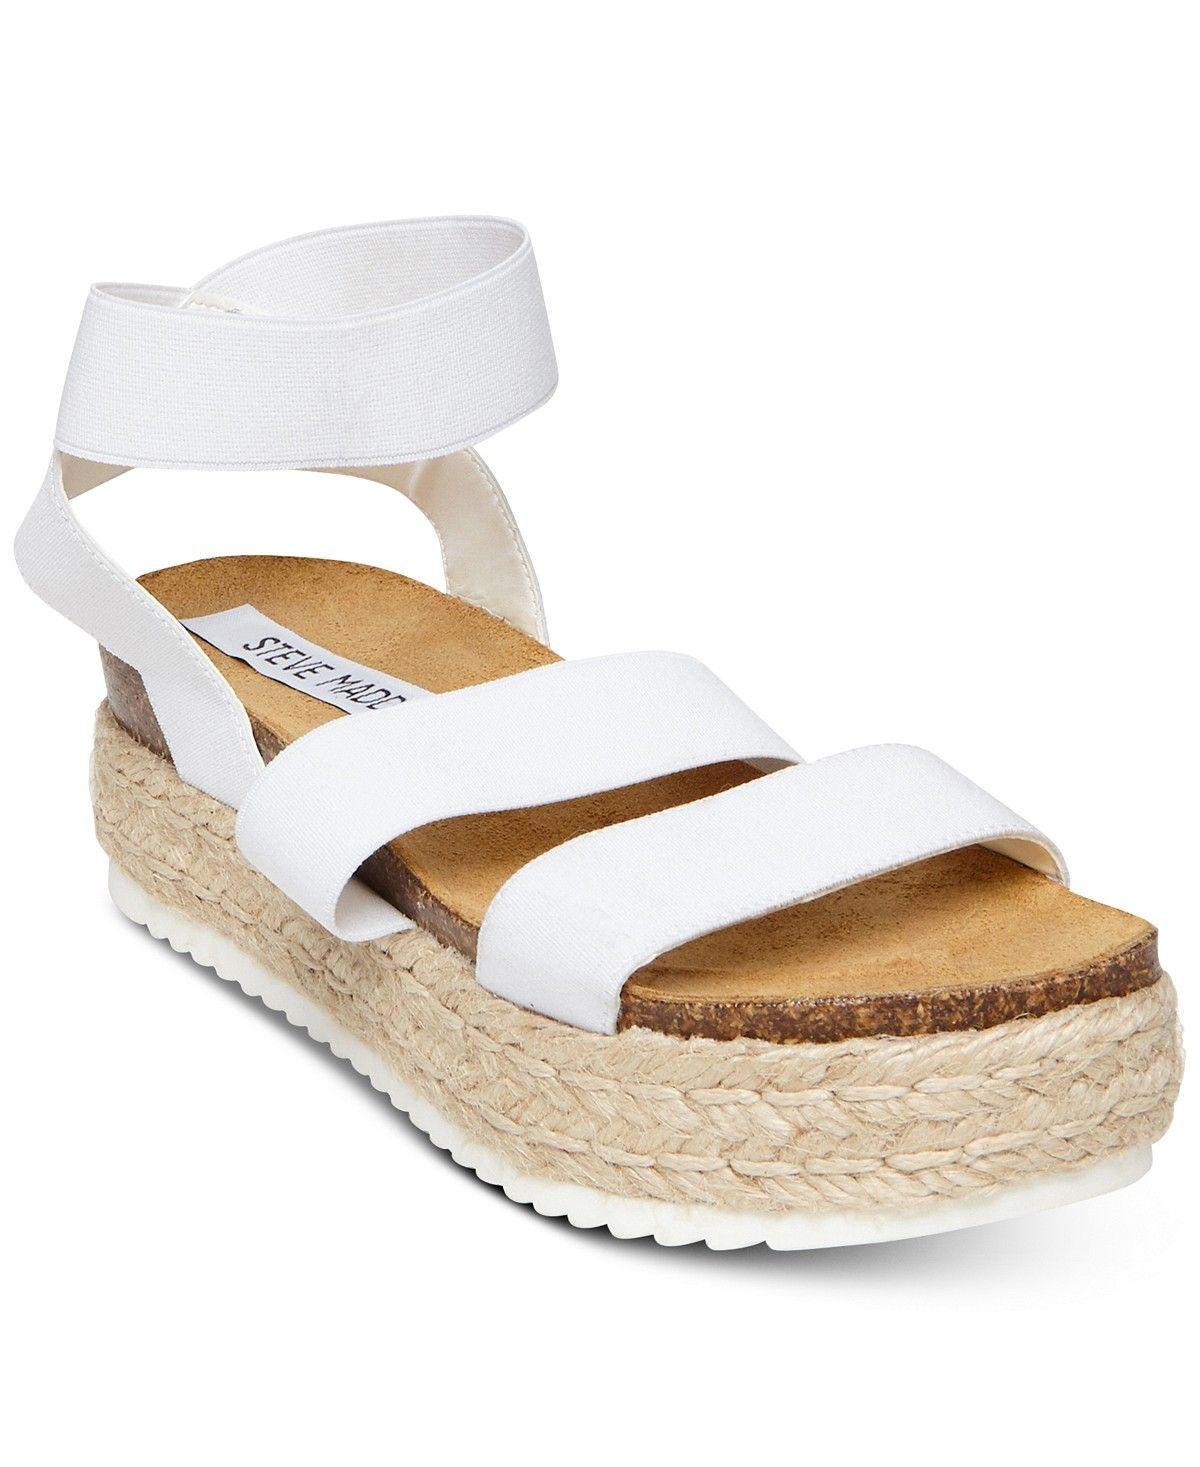 51b8d36c569 Steve Madden Women s Kimmie Flatform Espadrille Sandals - Sandals - Shoes -  Macy s